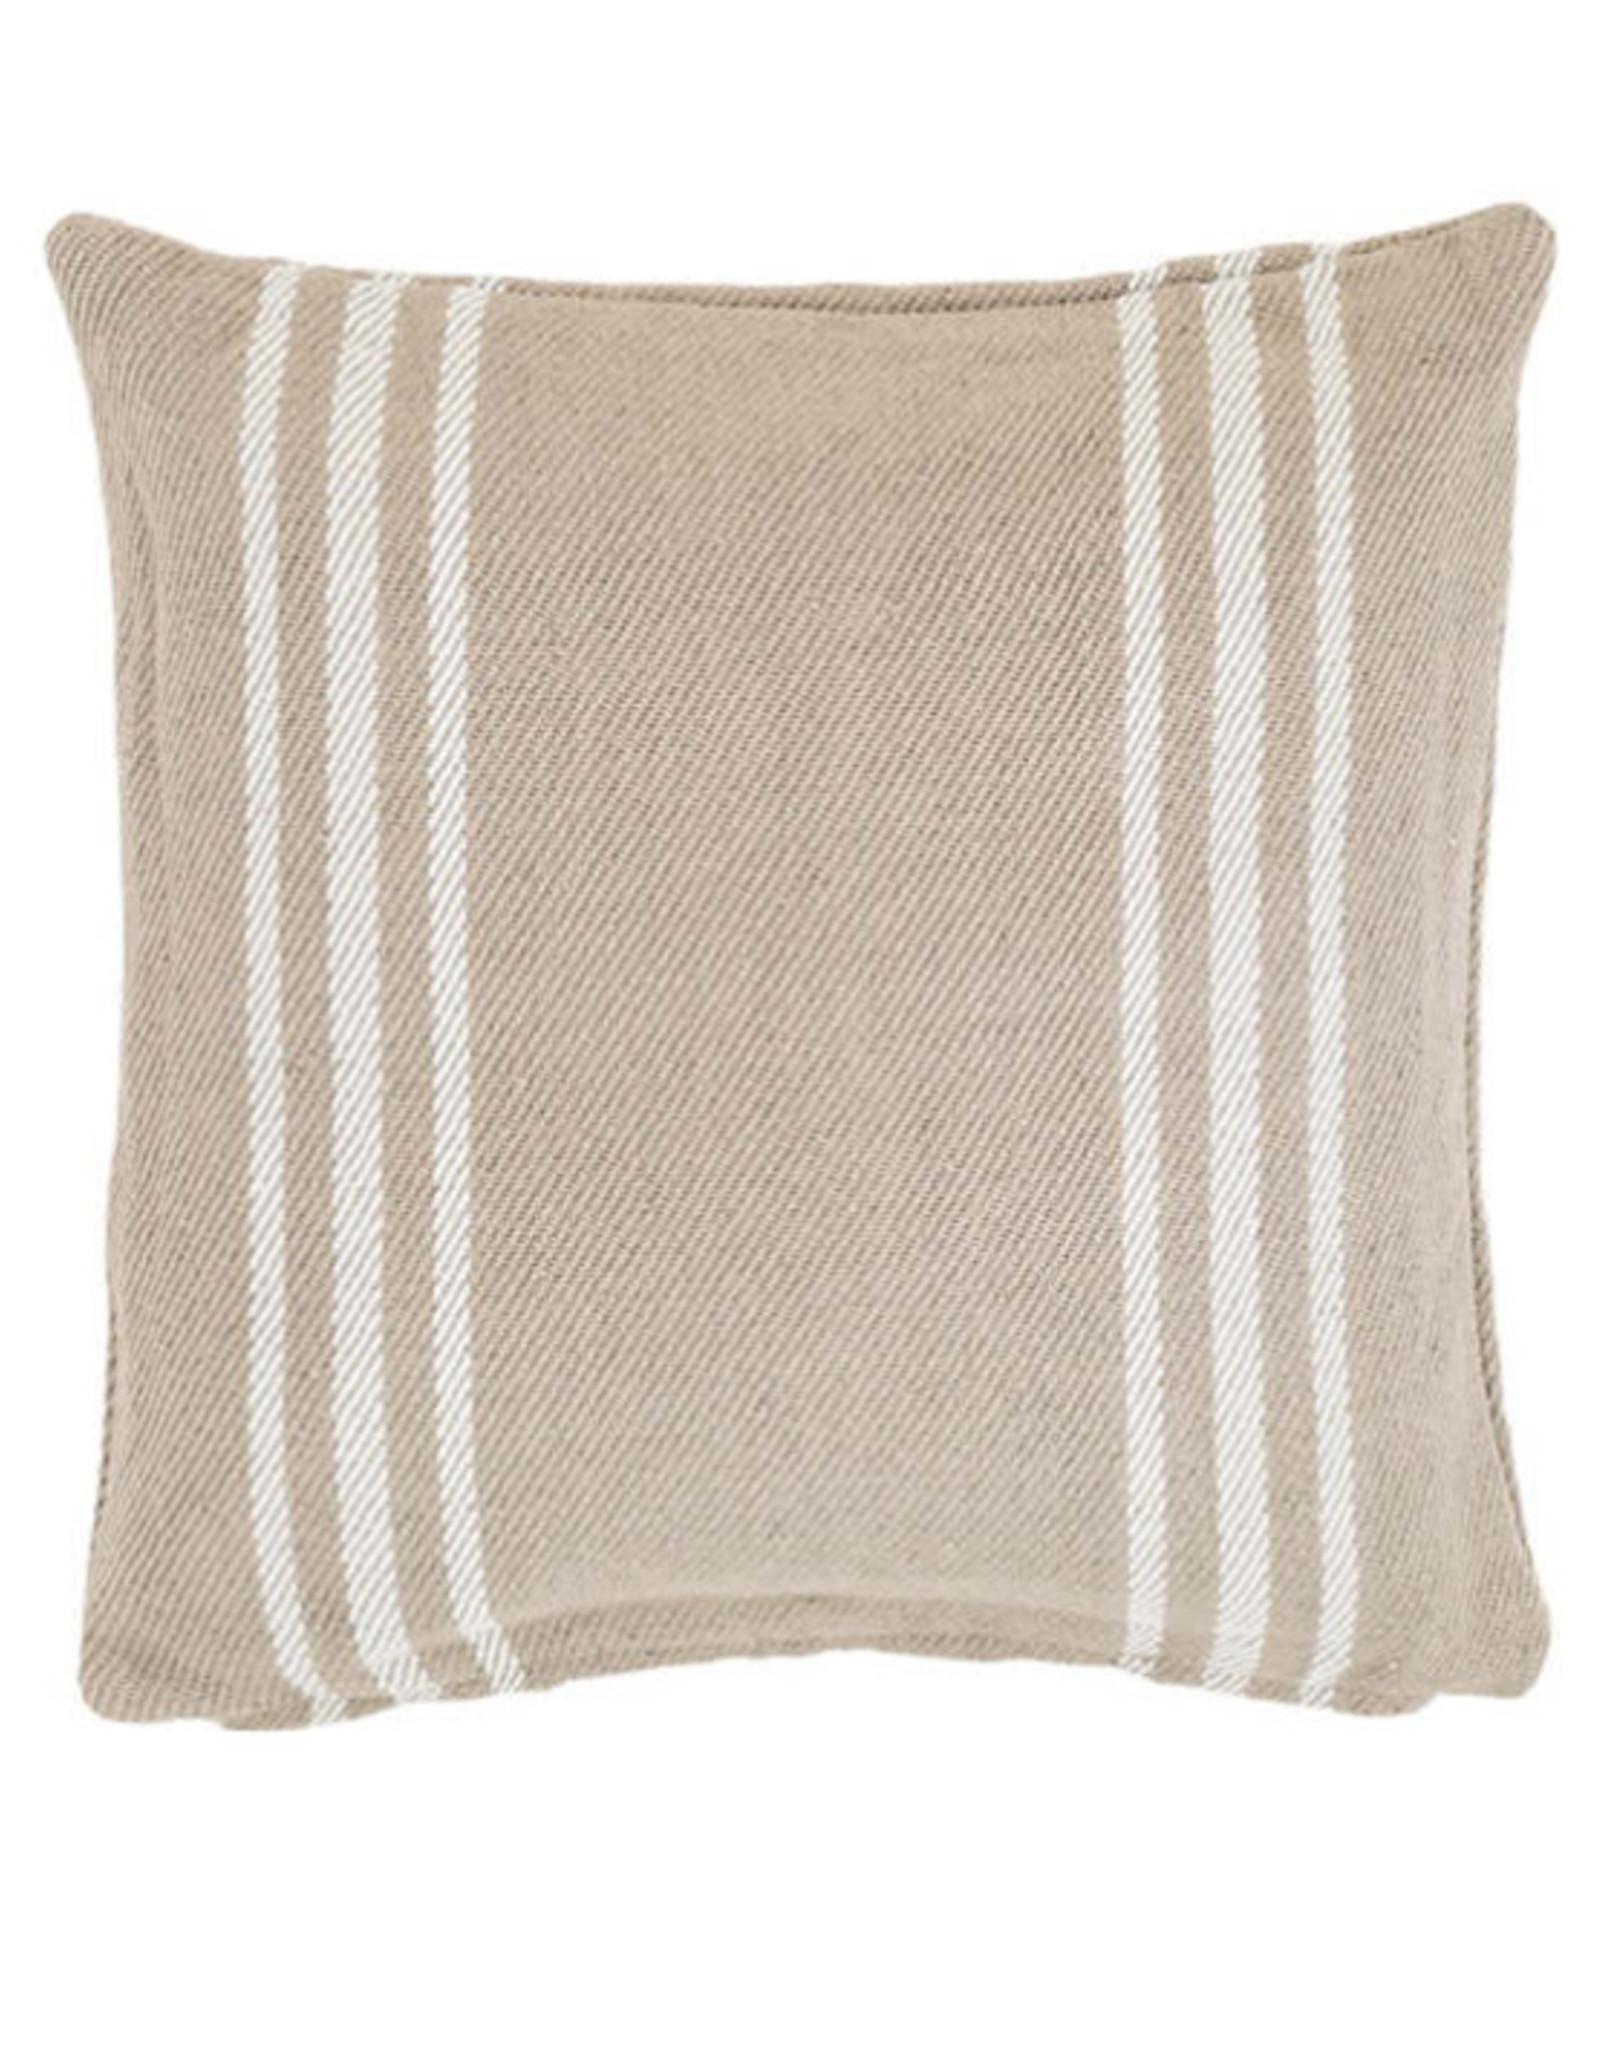 Cape Stripe 22x22 pillow